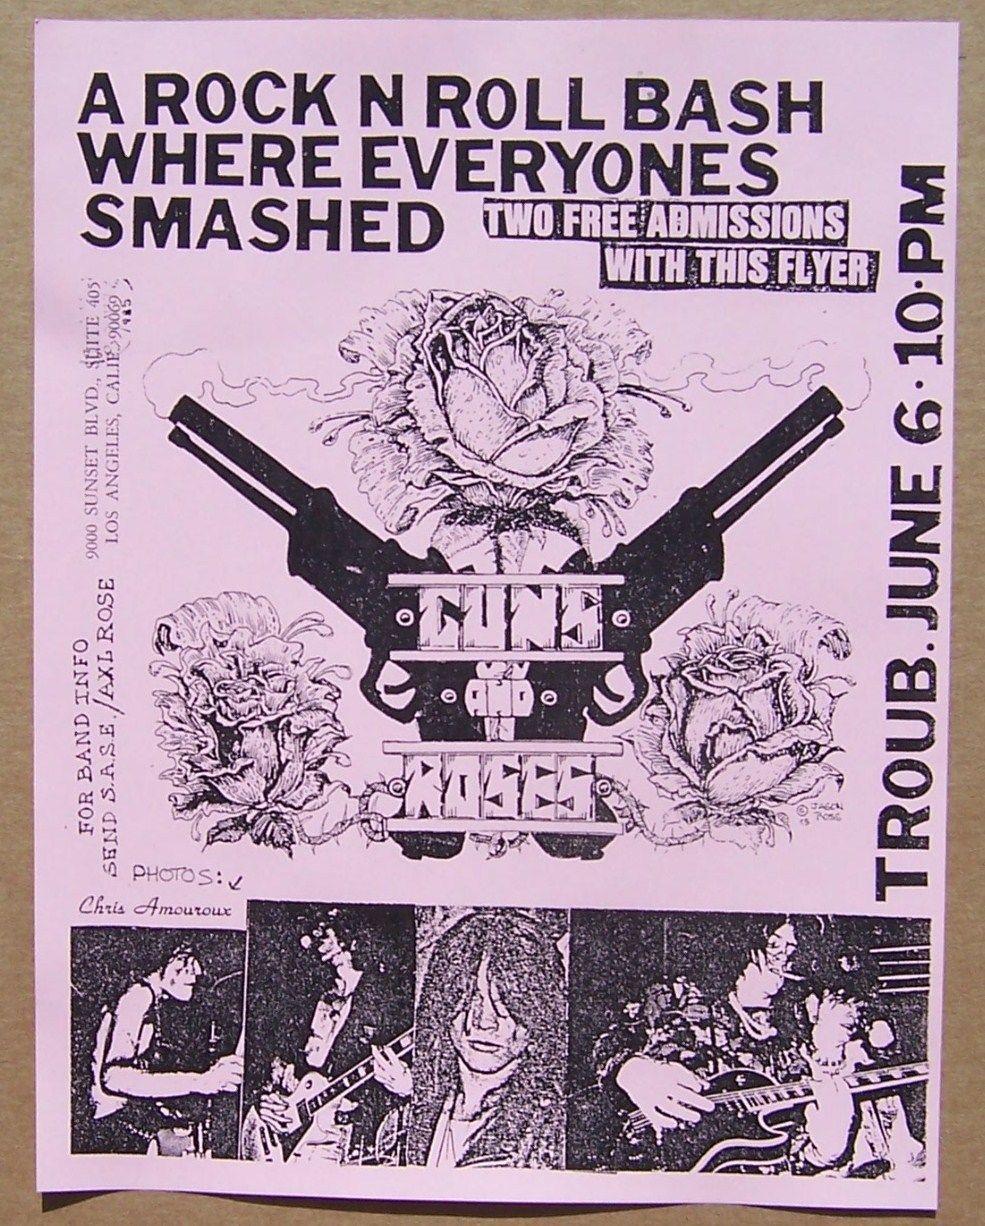 1985.06.06 - The Troubadour, Los Angeles, USA T2eC16V8E9s4l7eBRDvOi4yw60_57